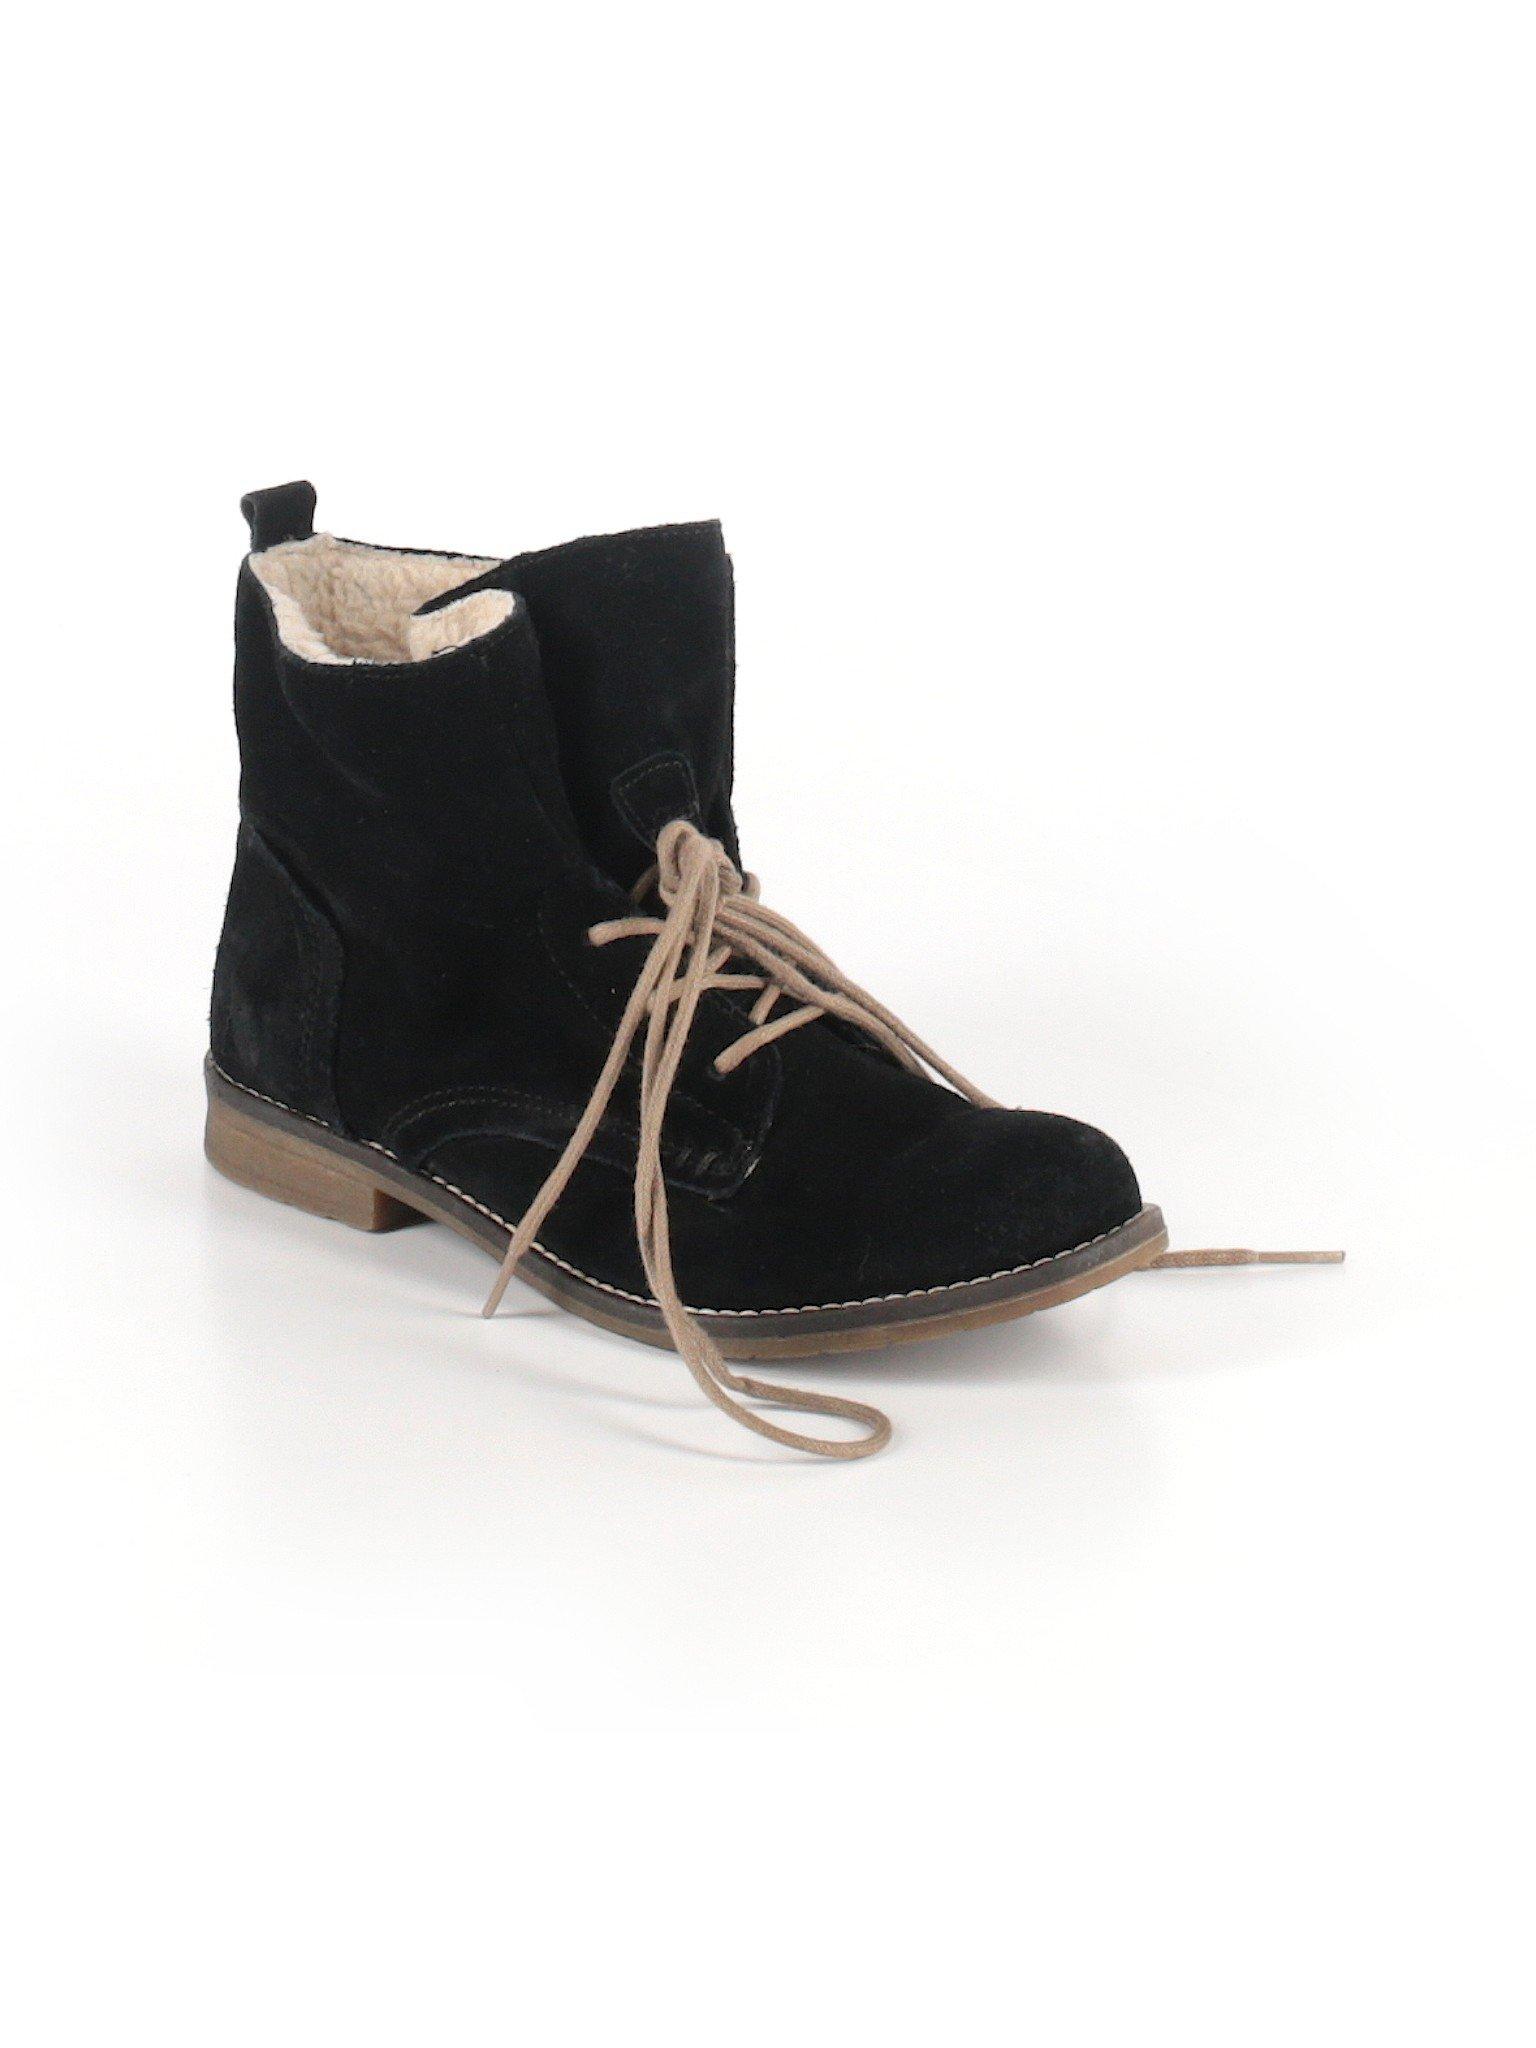 Boots Boutique Steve Ankle Madden promotion qUX1I